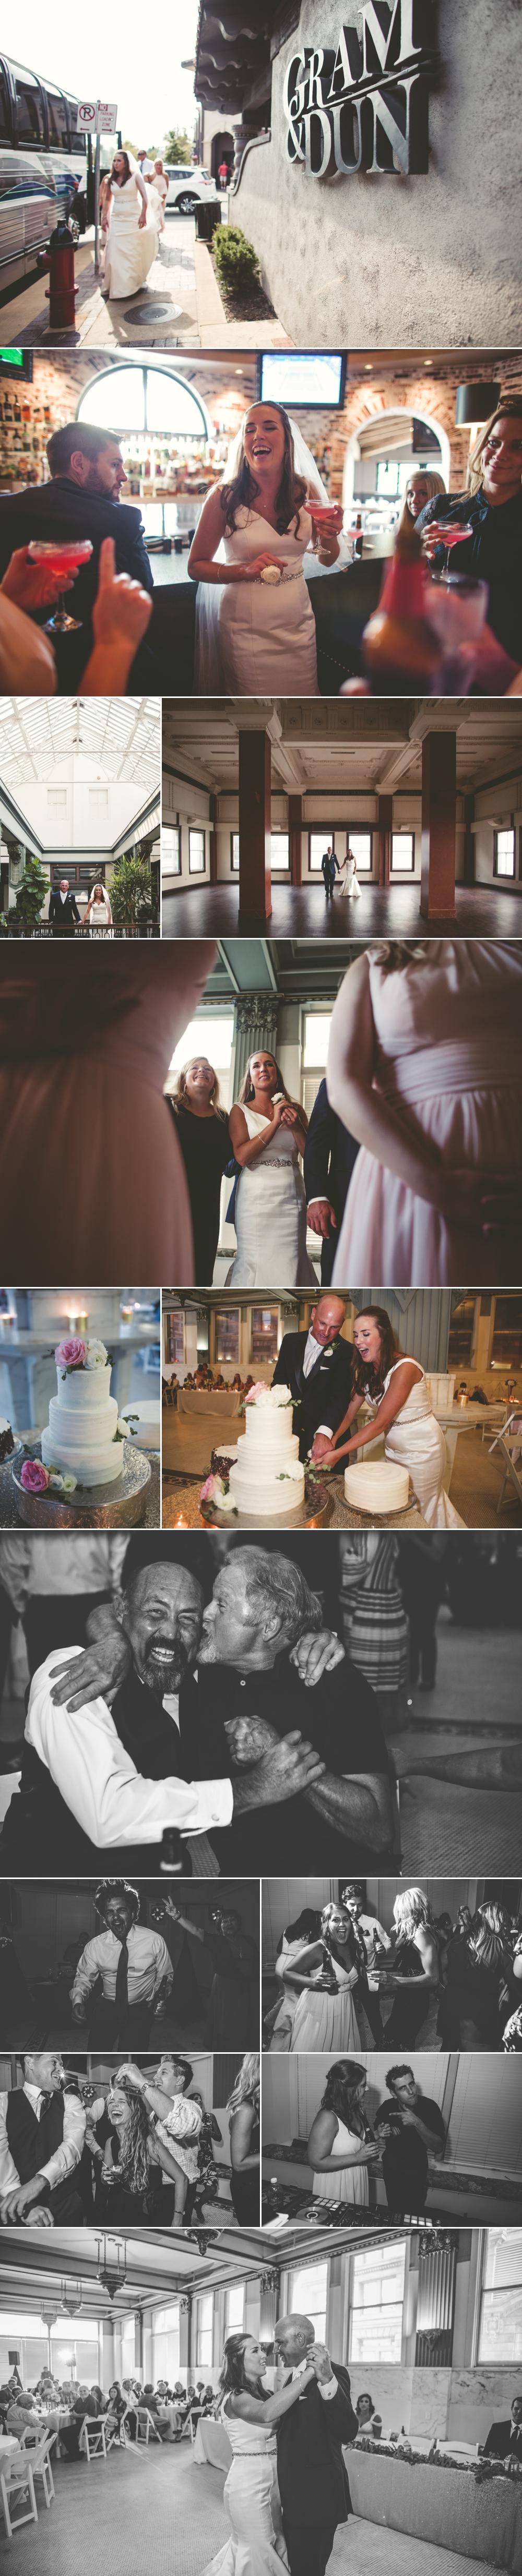 jason_domingues_photograhy_best_kansas_city_wedding_photographer_kc_weddings_scarritt_building_cure_of_ars_0003.JPG